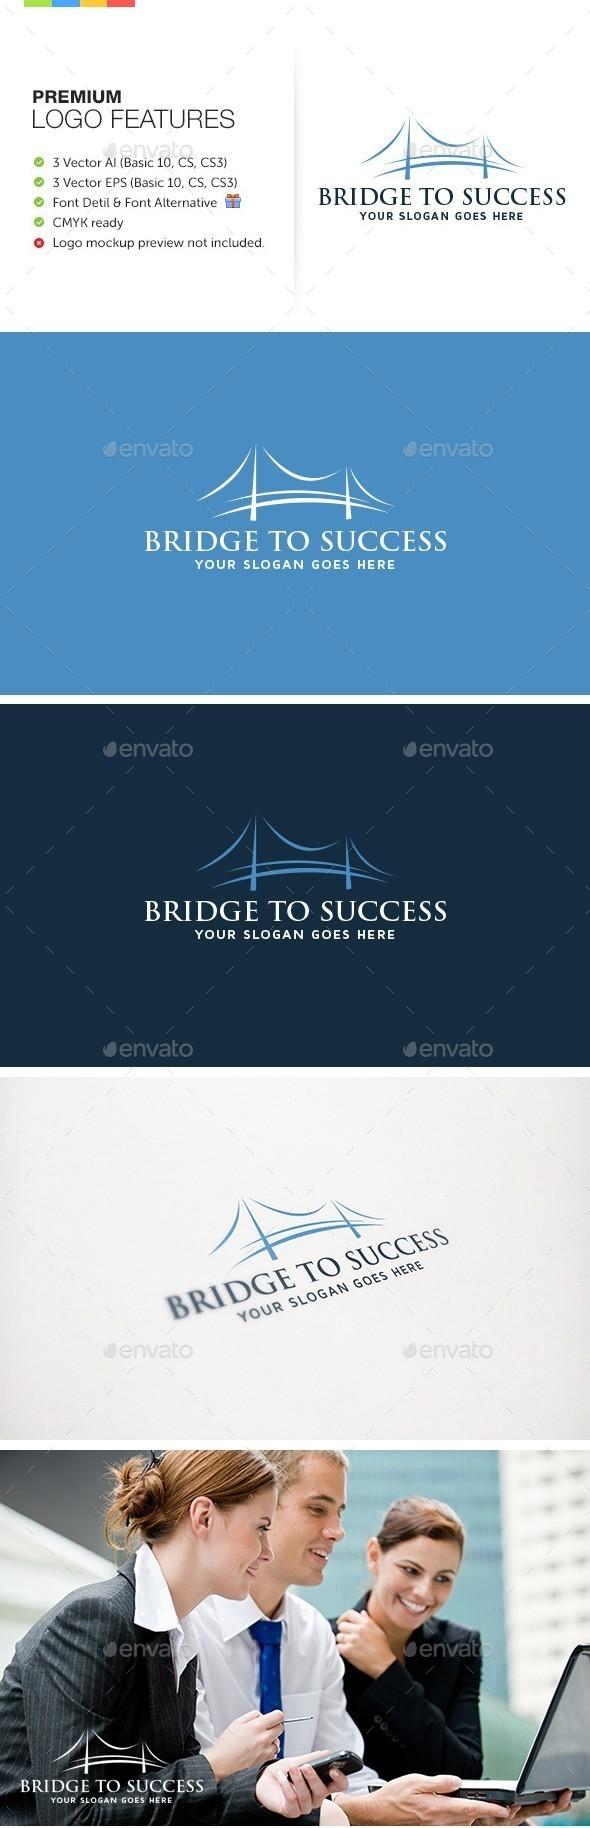 GraphicRiver Bridge to Success 9207188